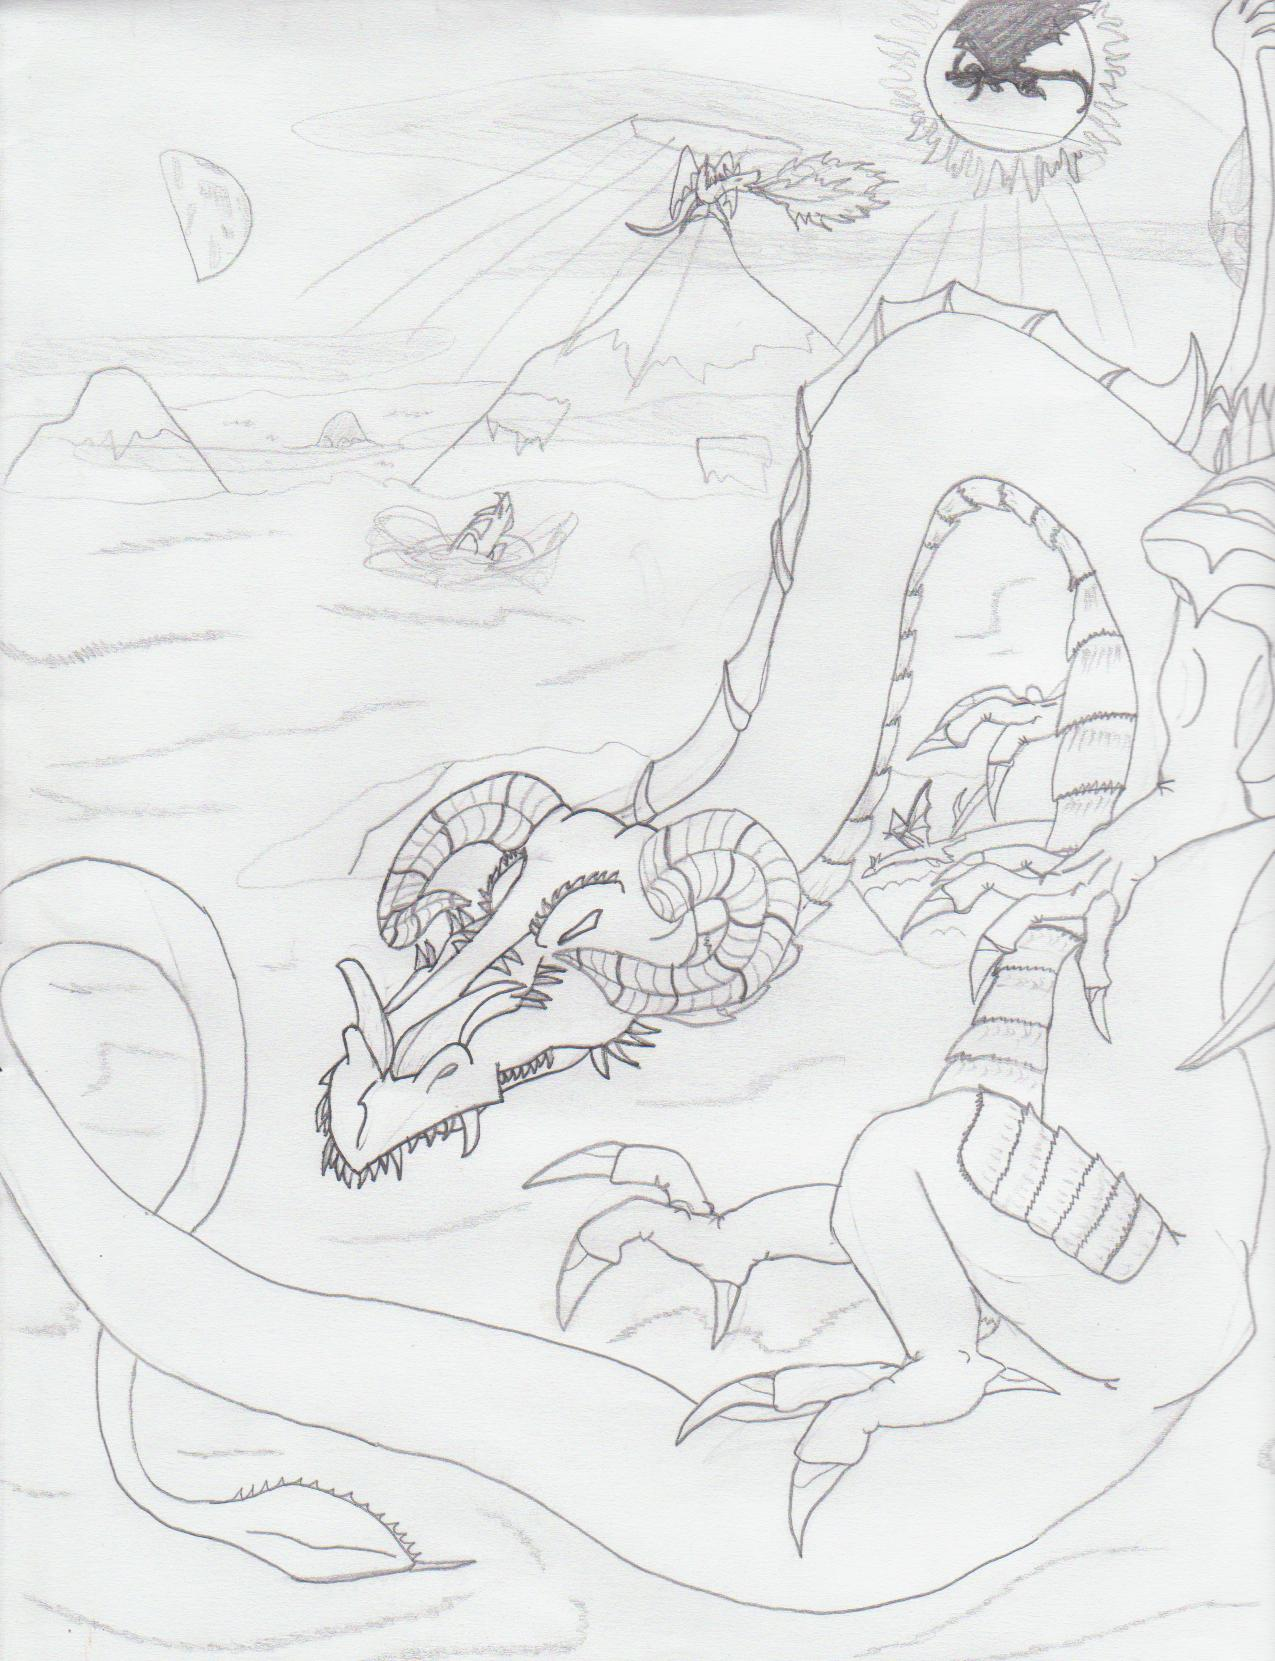 Dragonz everywhere!